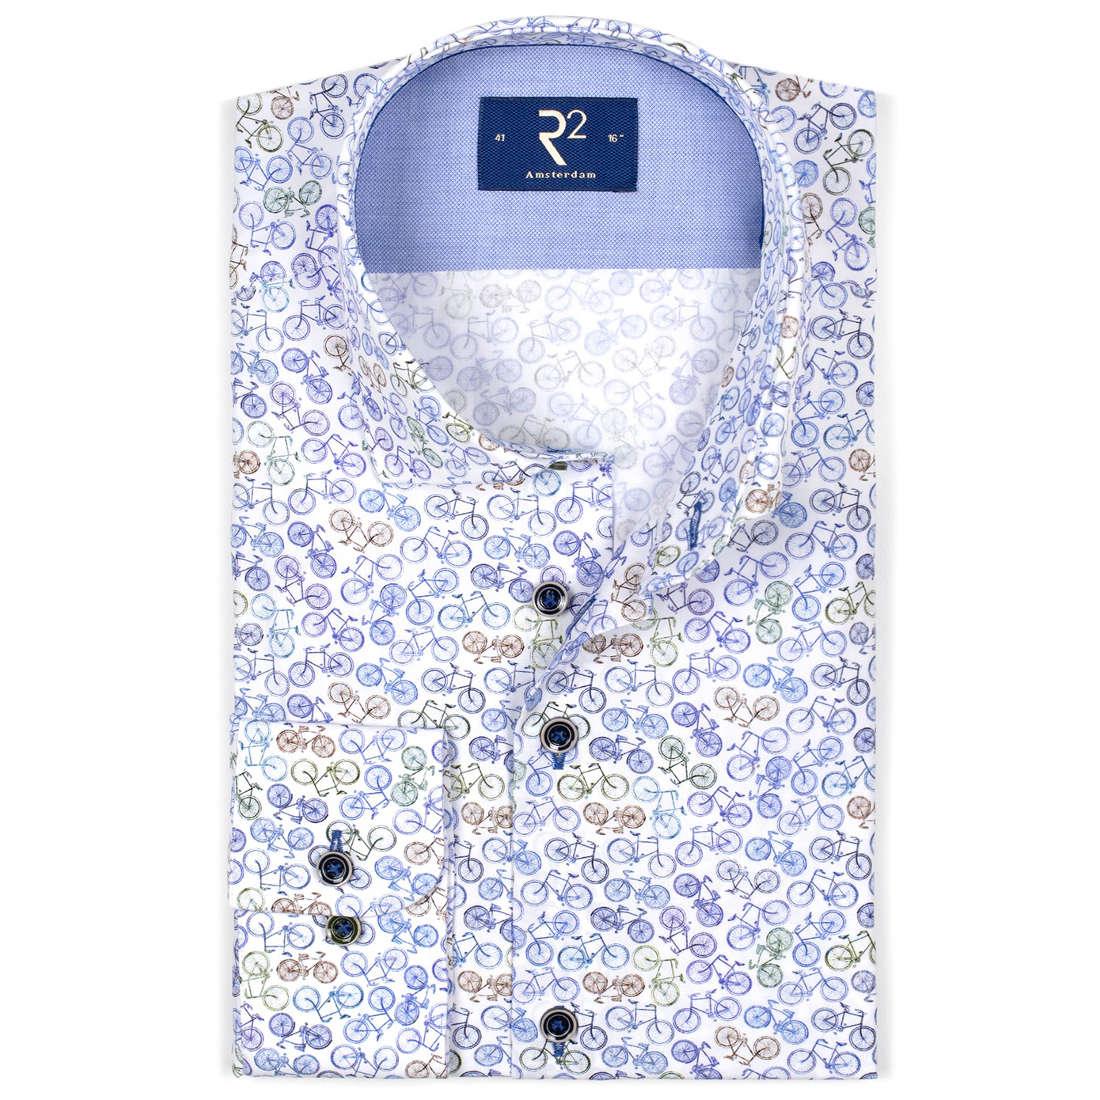 R2 overhemd Modern Fit 104wsp052/014 in het Multicolor